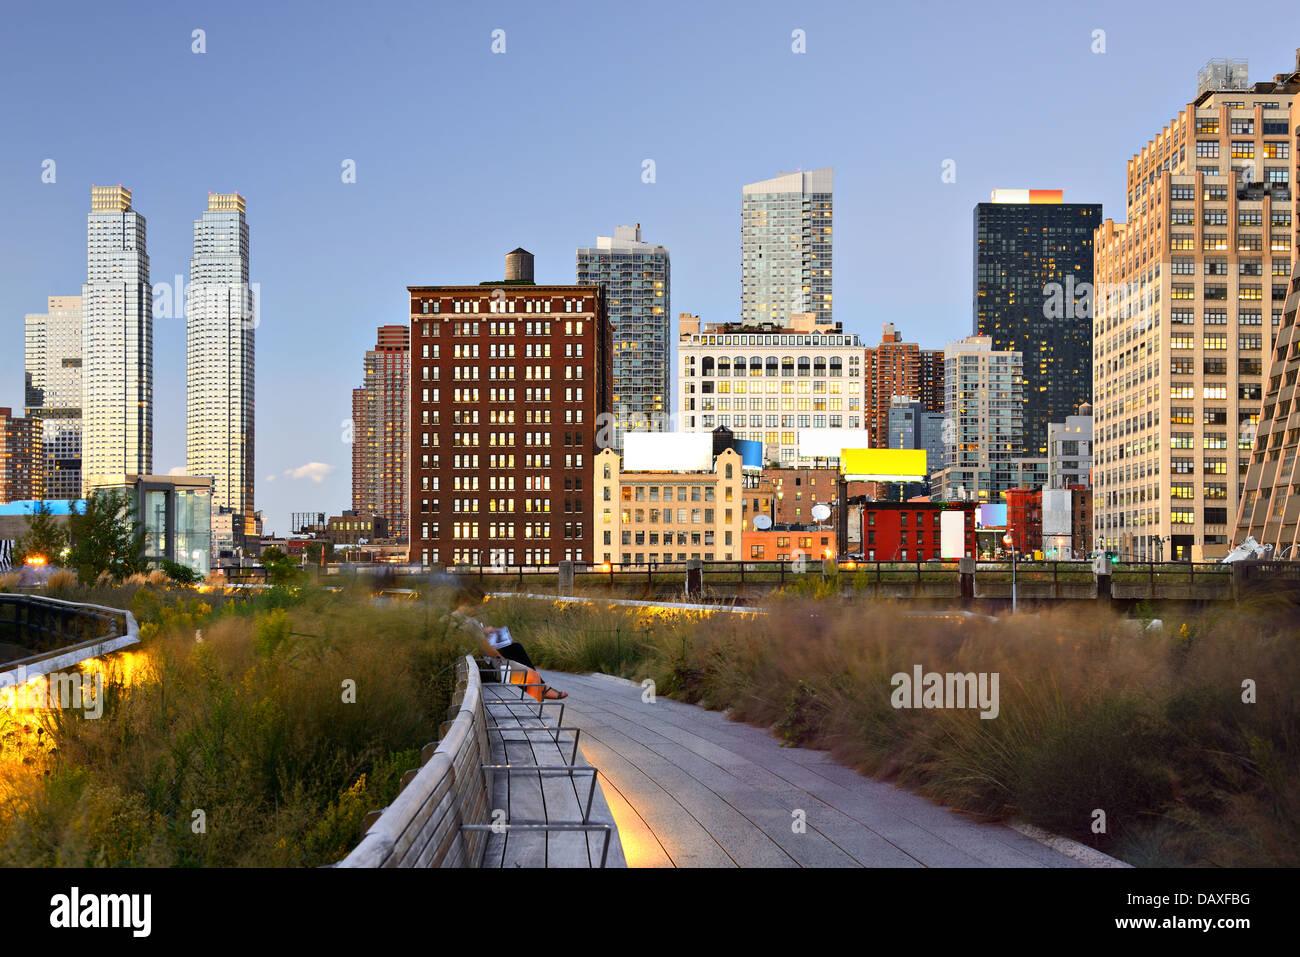 New York City High Line à nuit à New York City. Photo Stock